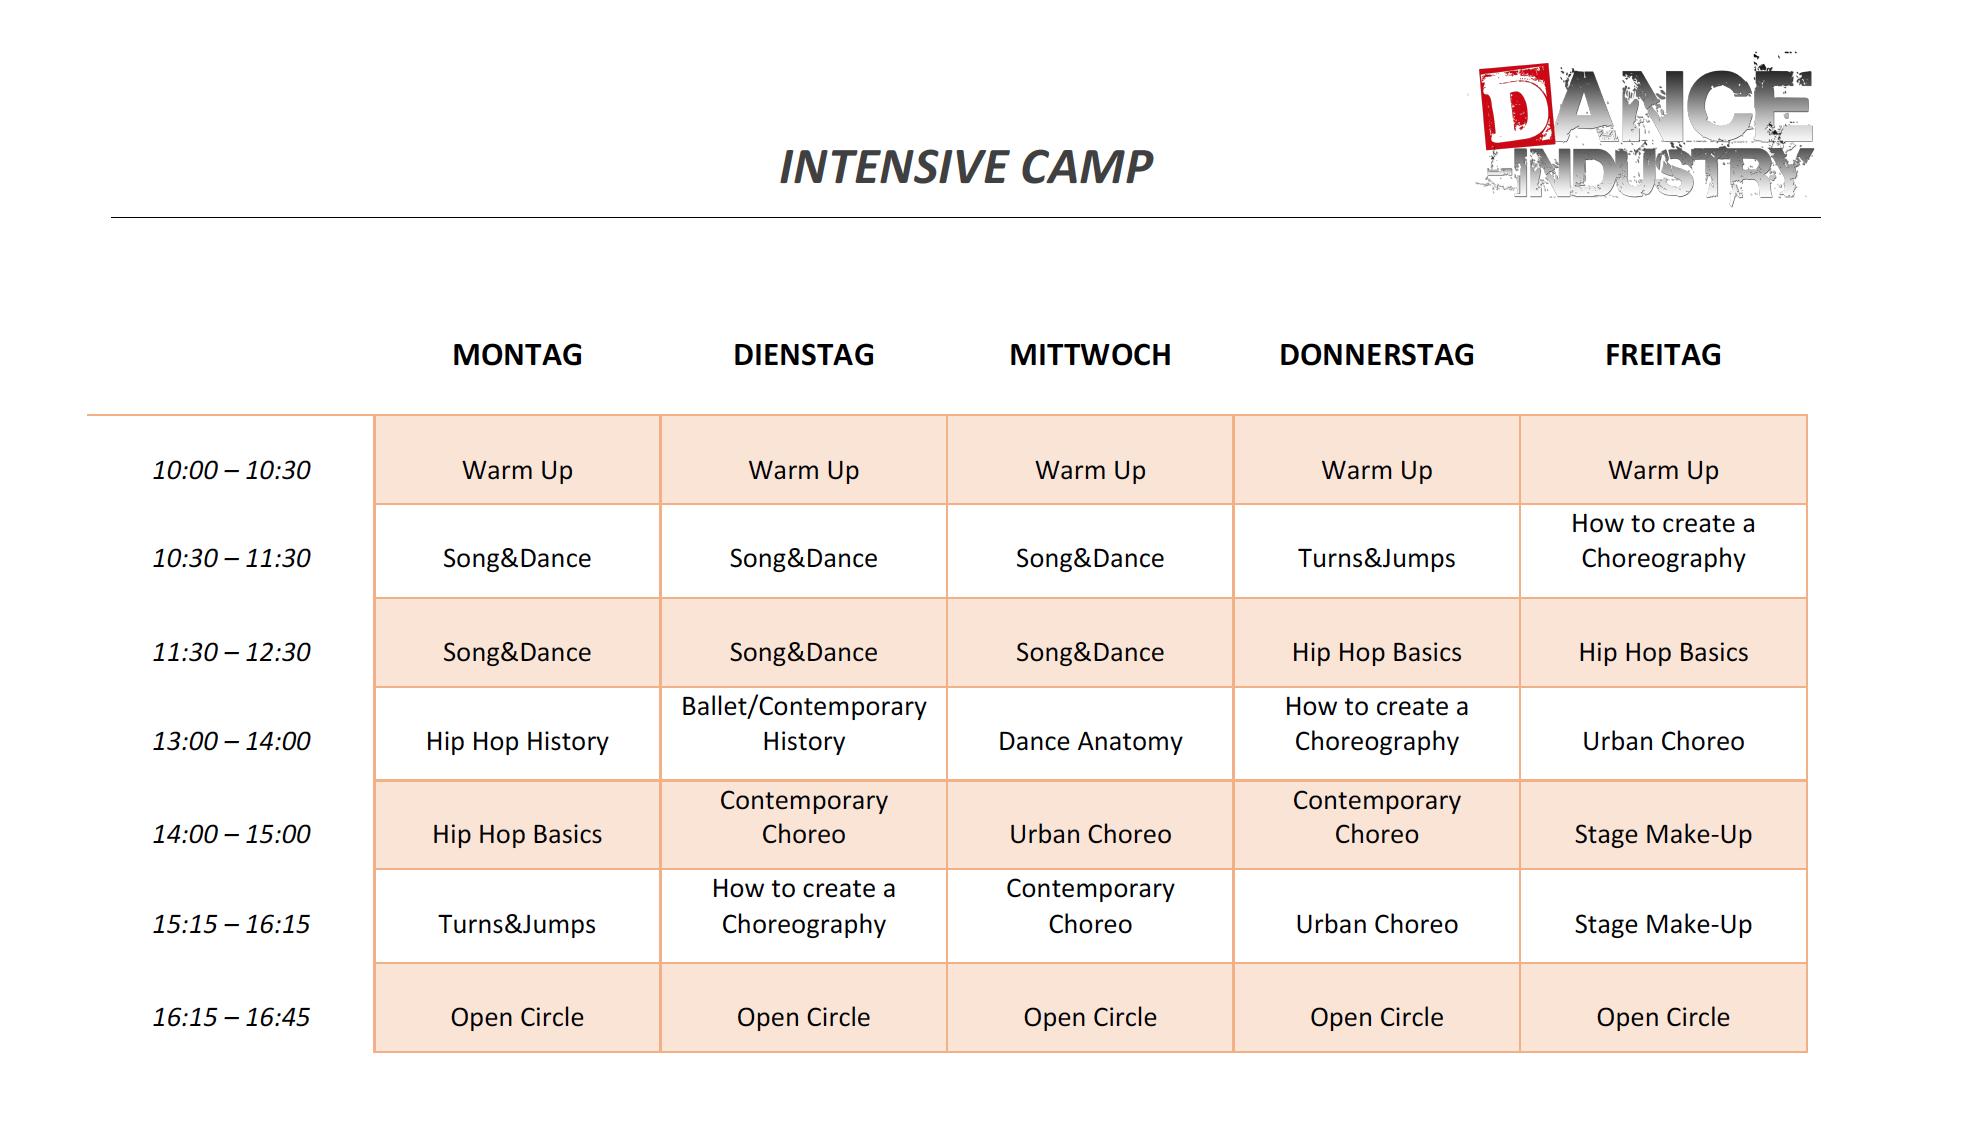 Stundenplan Intensive Camp